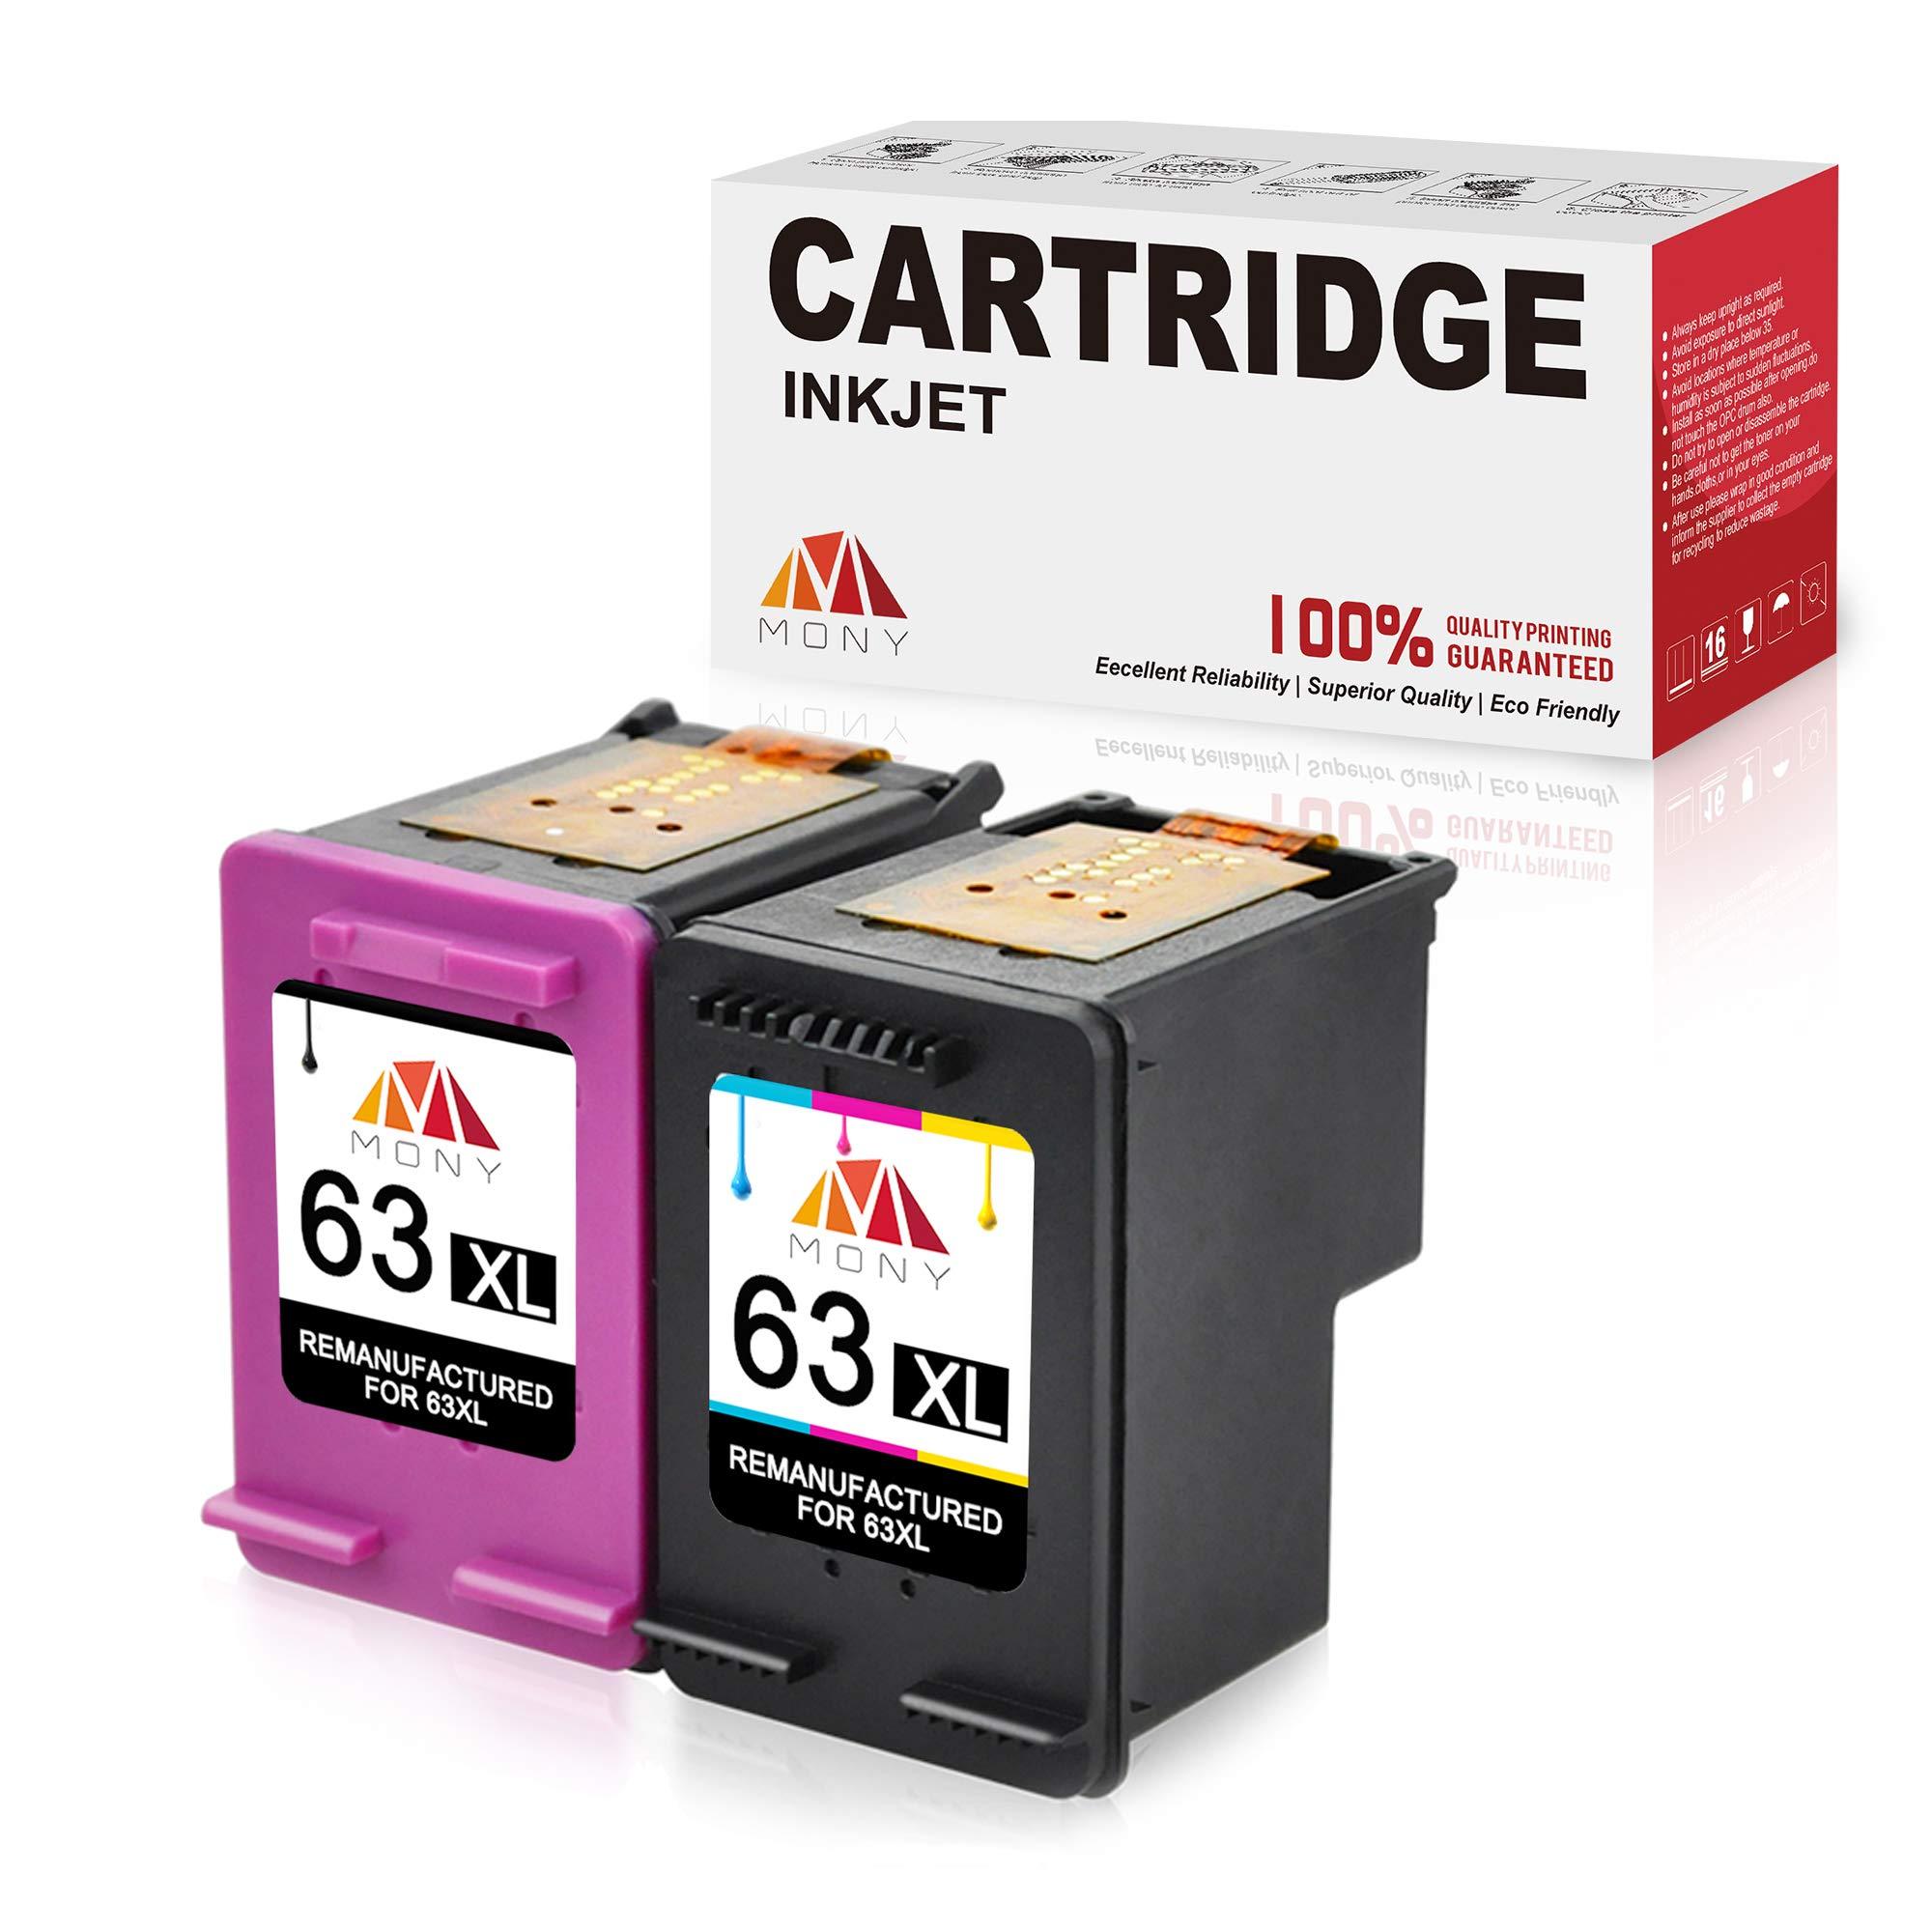 Mony Remanufactured HP 63 63XL Ink Cartridges (1 Black, 1 Tri-Color) Replacement for HP Officejet 5255 5258 4650 3830 4655 Envy 4520 4512 Deskjet 2132 3632 3630 1112 2130 Printer, Ink Level Display